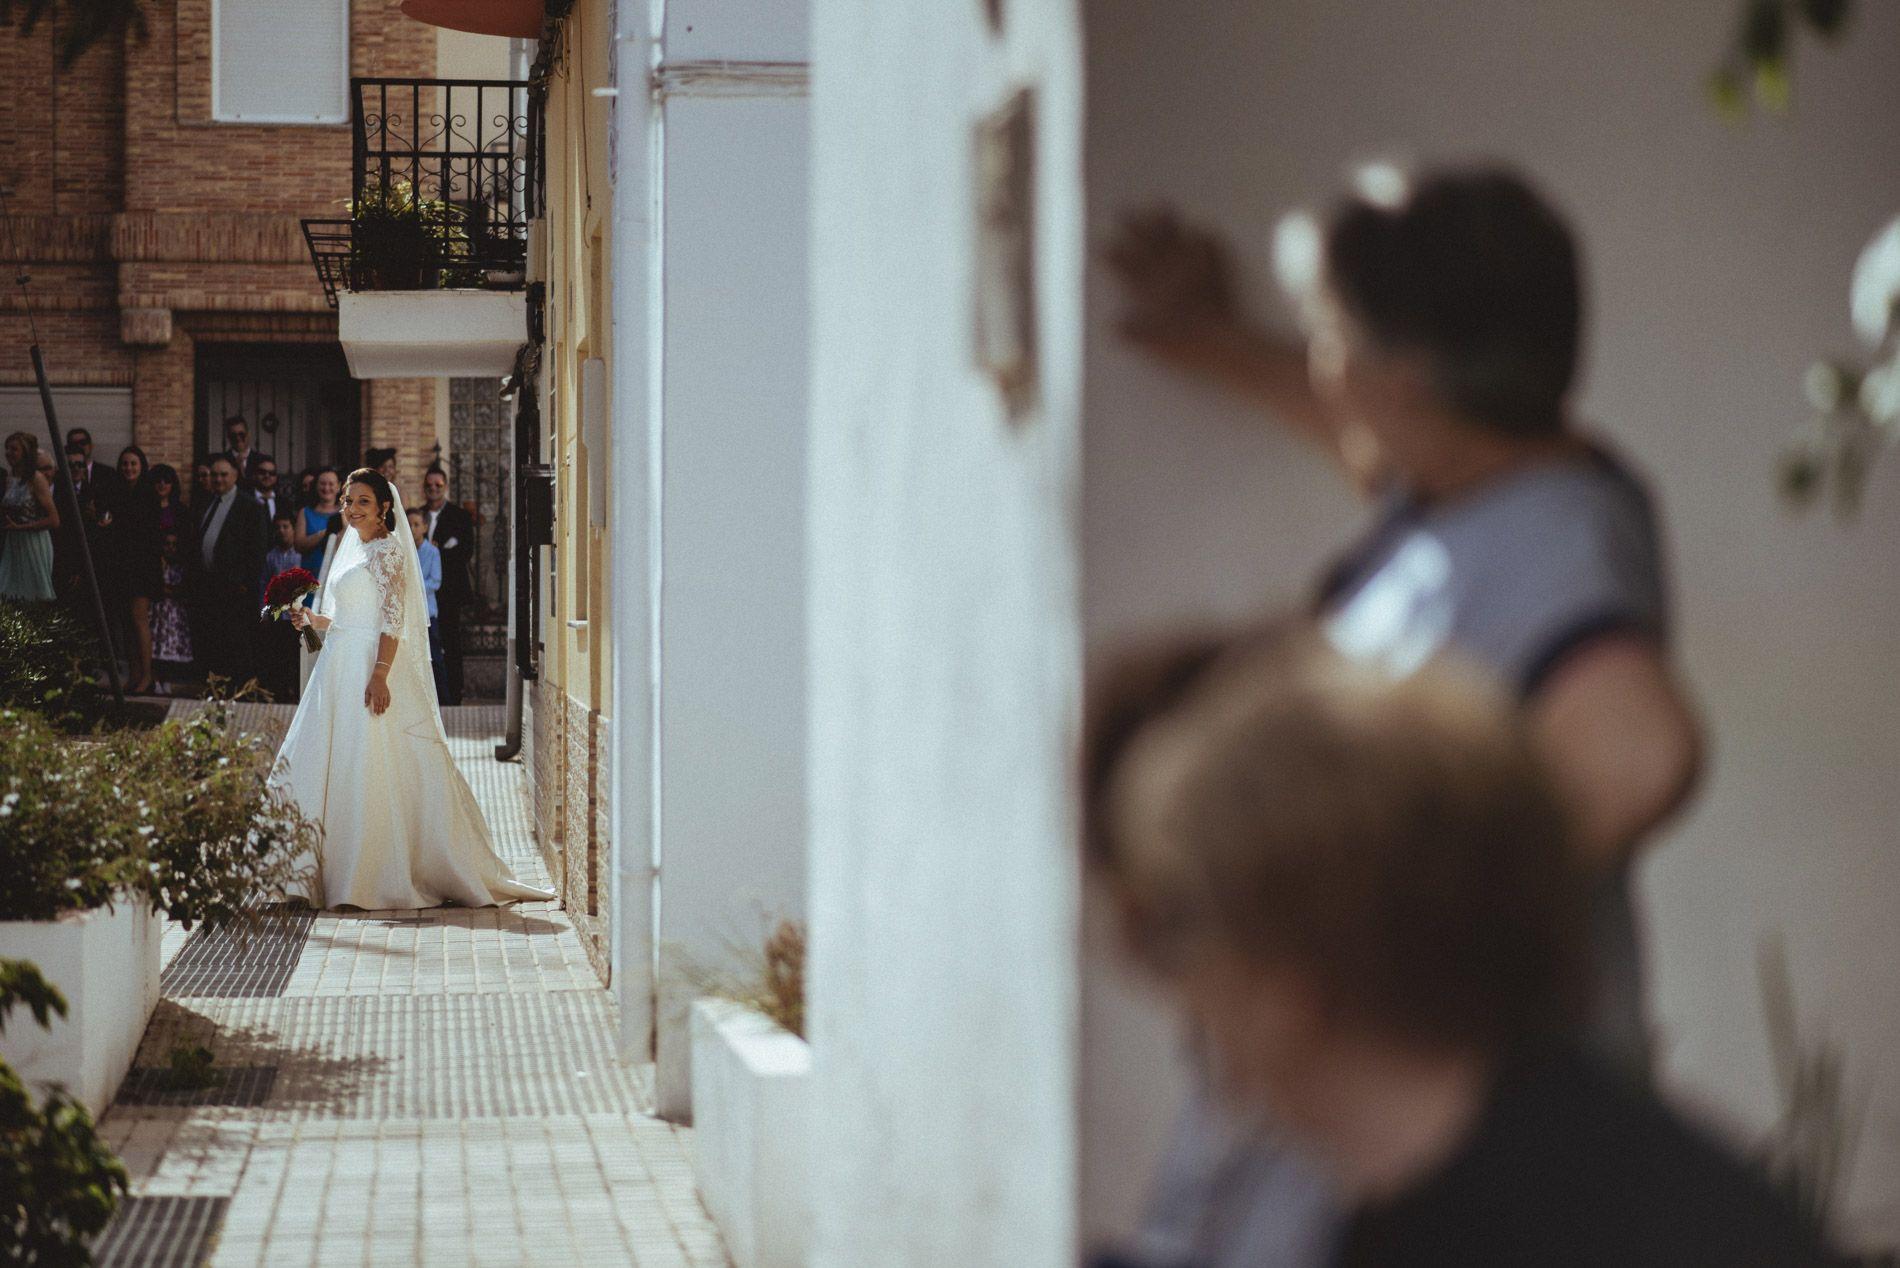 fotografia-boda-santi-miquel-bj-016